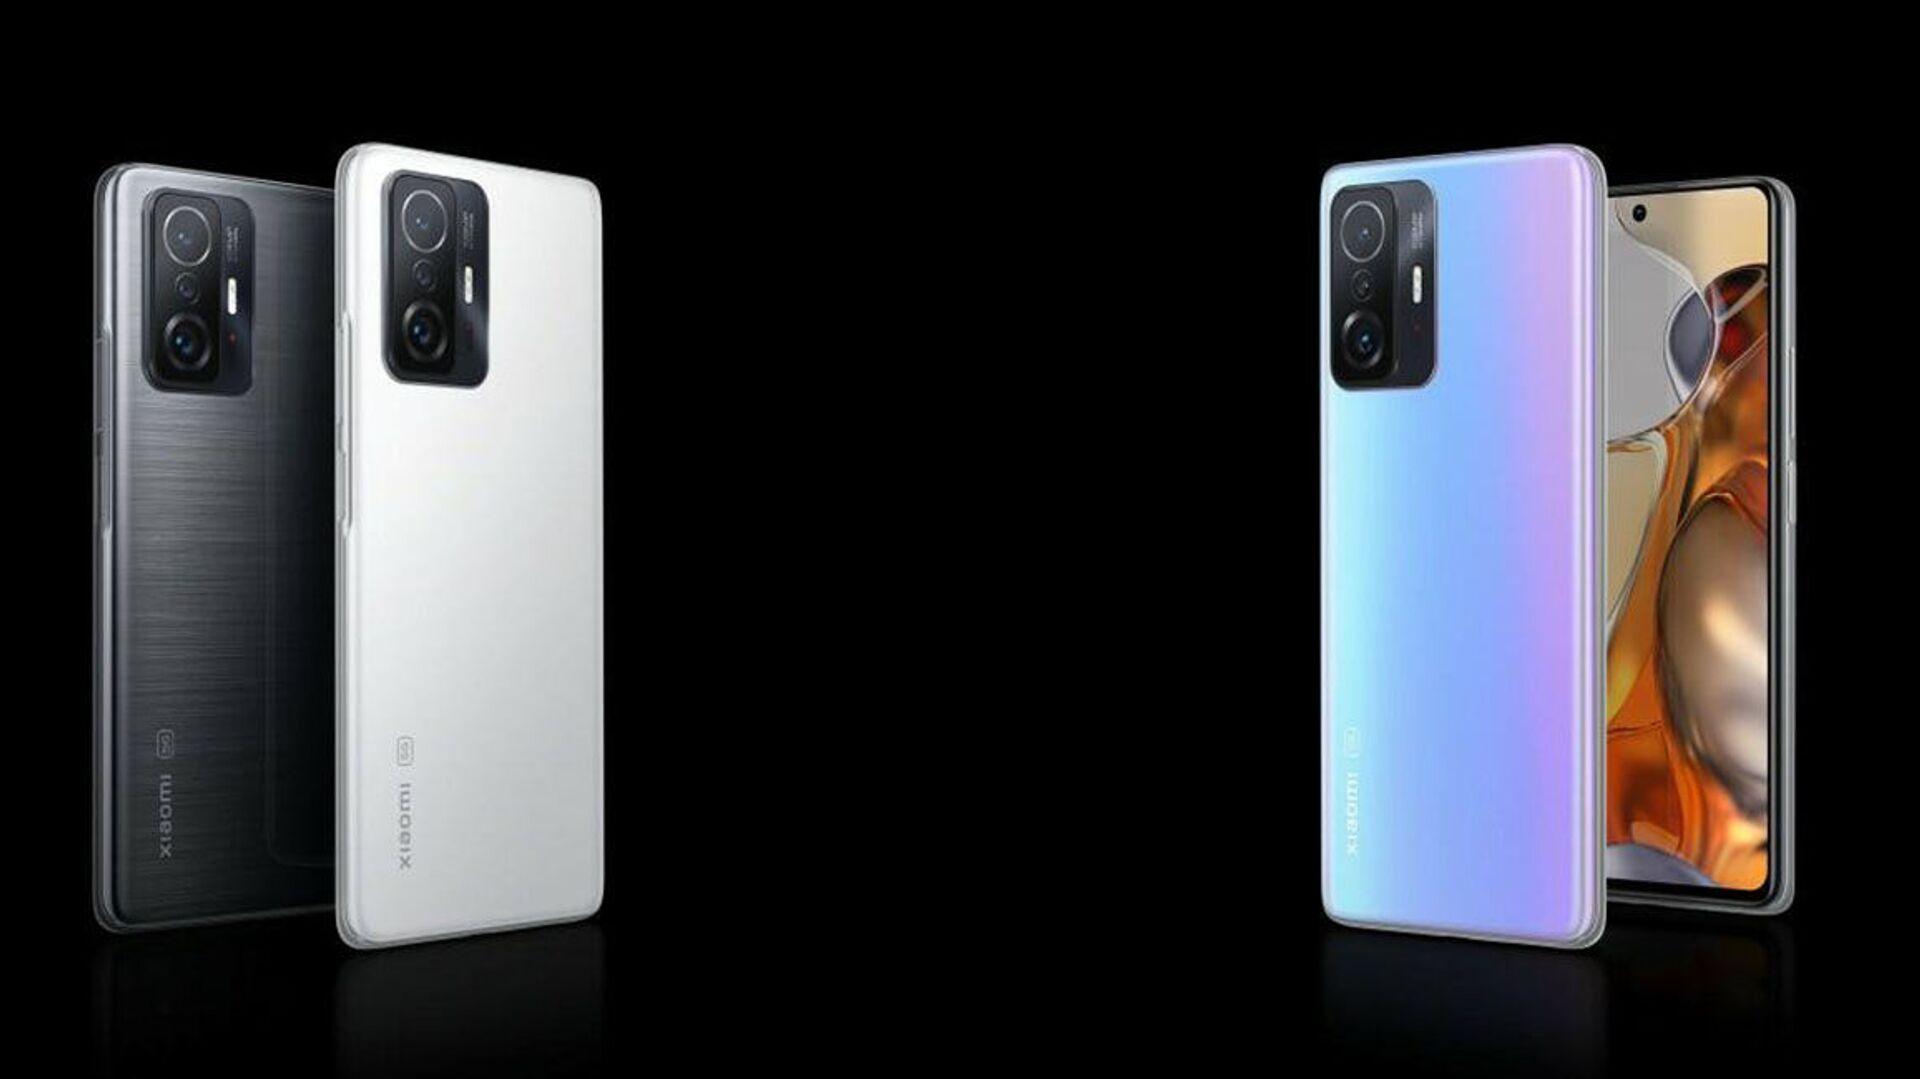 Gli smartphone Xiaomi 11T Pro - Sputnik Italia, 1920, 18.09.2021